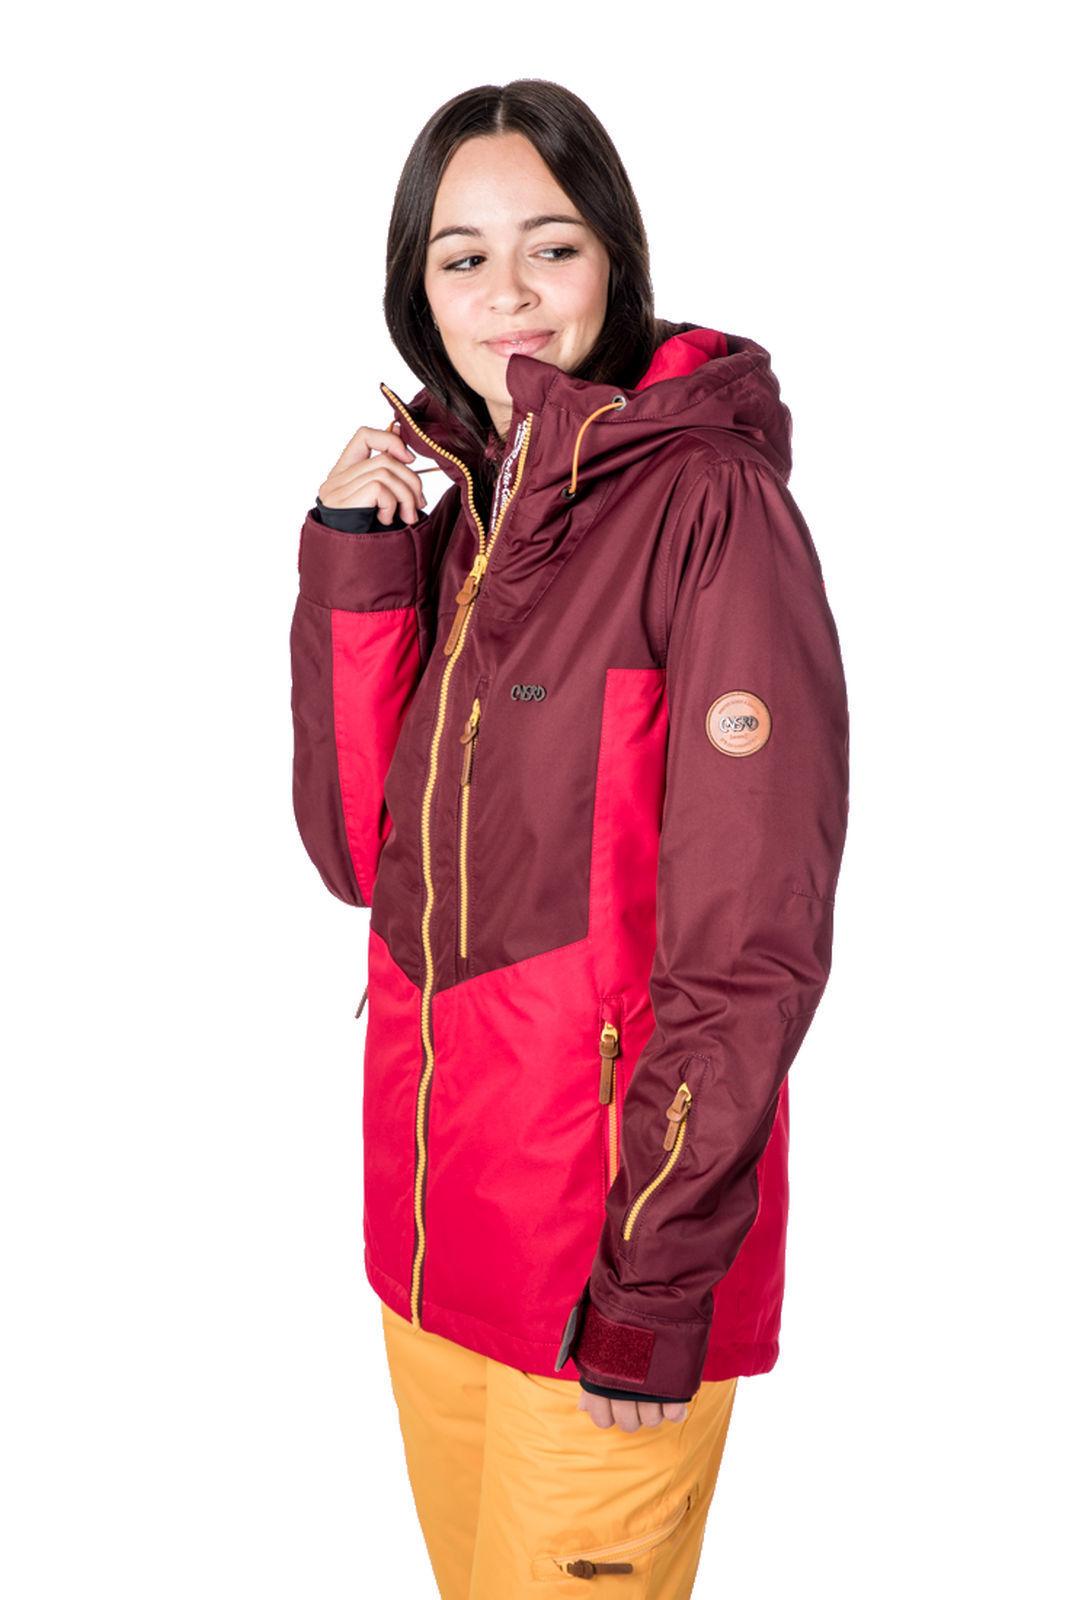 CSNRD Damen Snowboard-     Skijacke GOGO Jacket fuchsia 312bb3